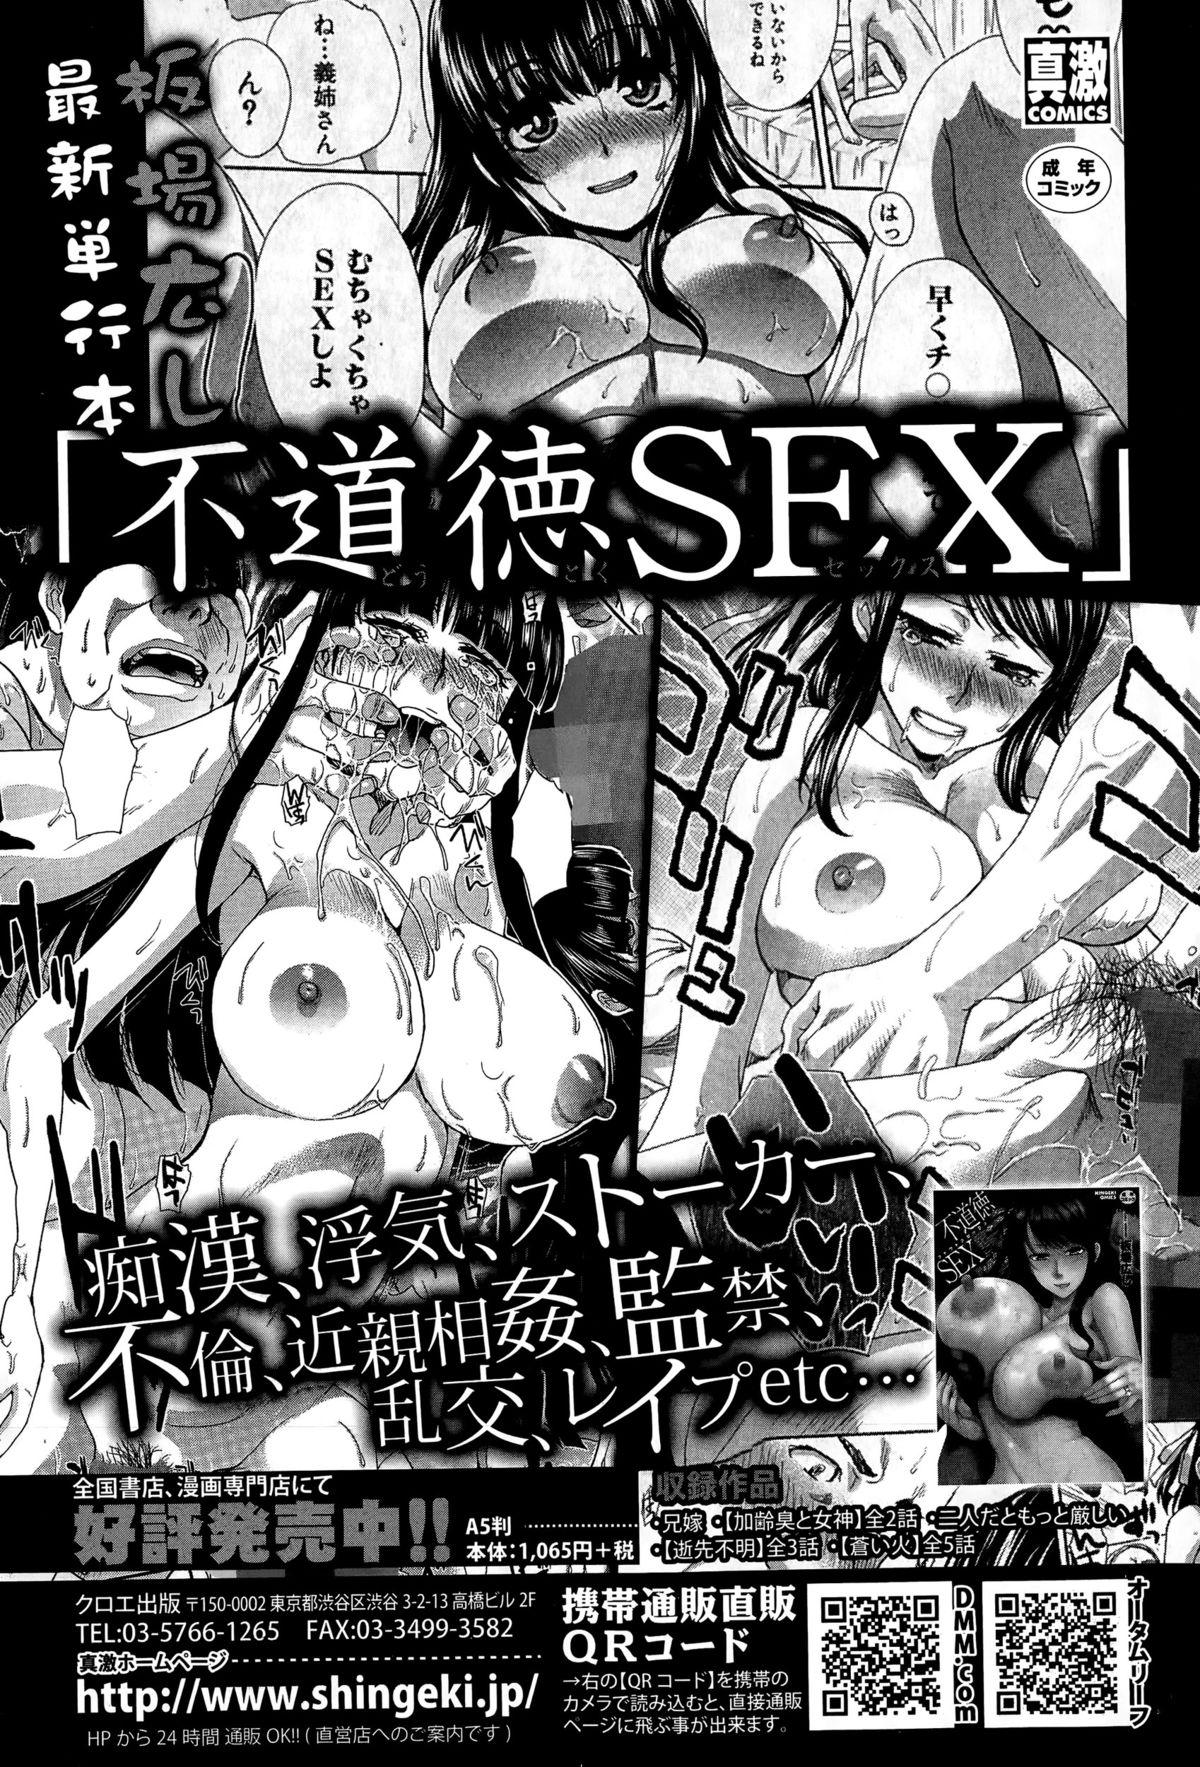 COMIC Shingeki 2015-07 146